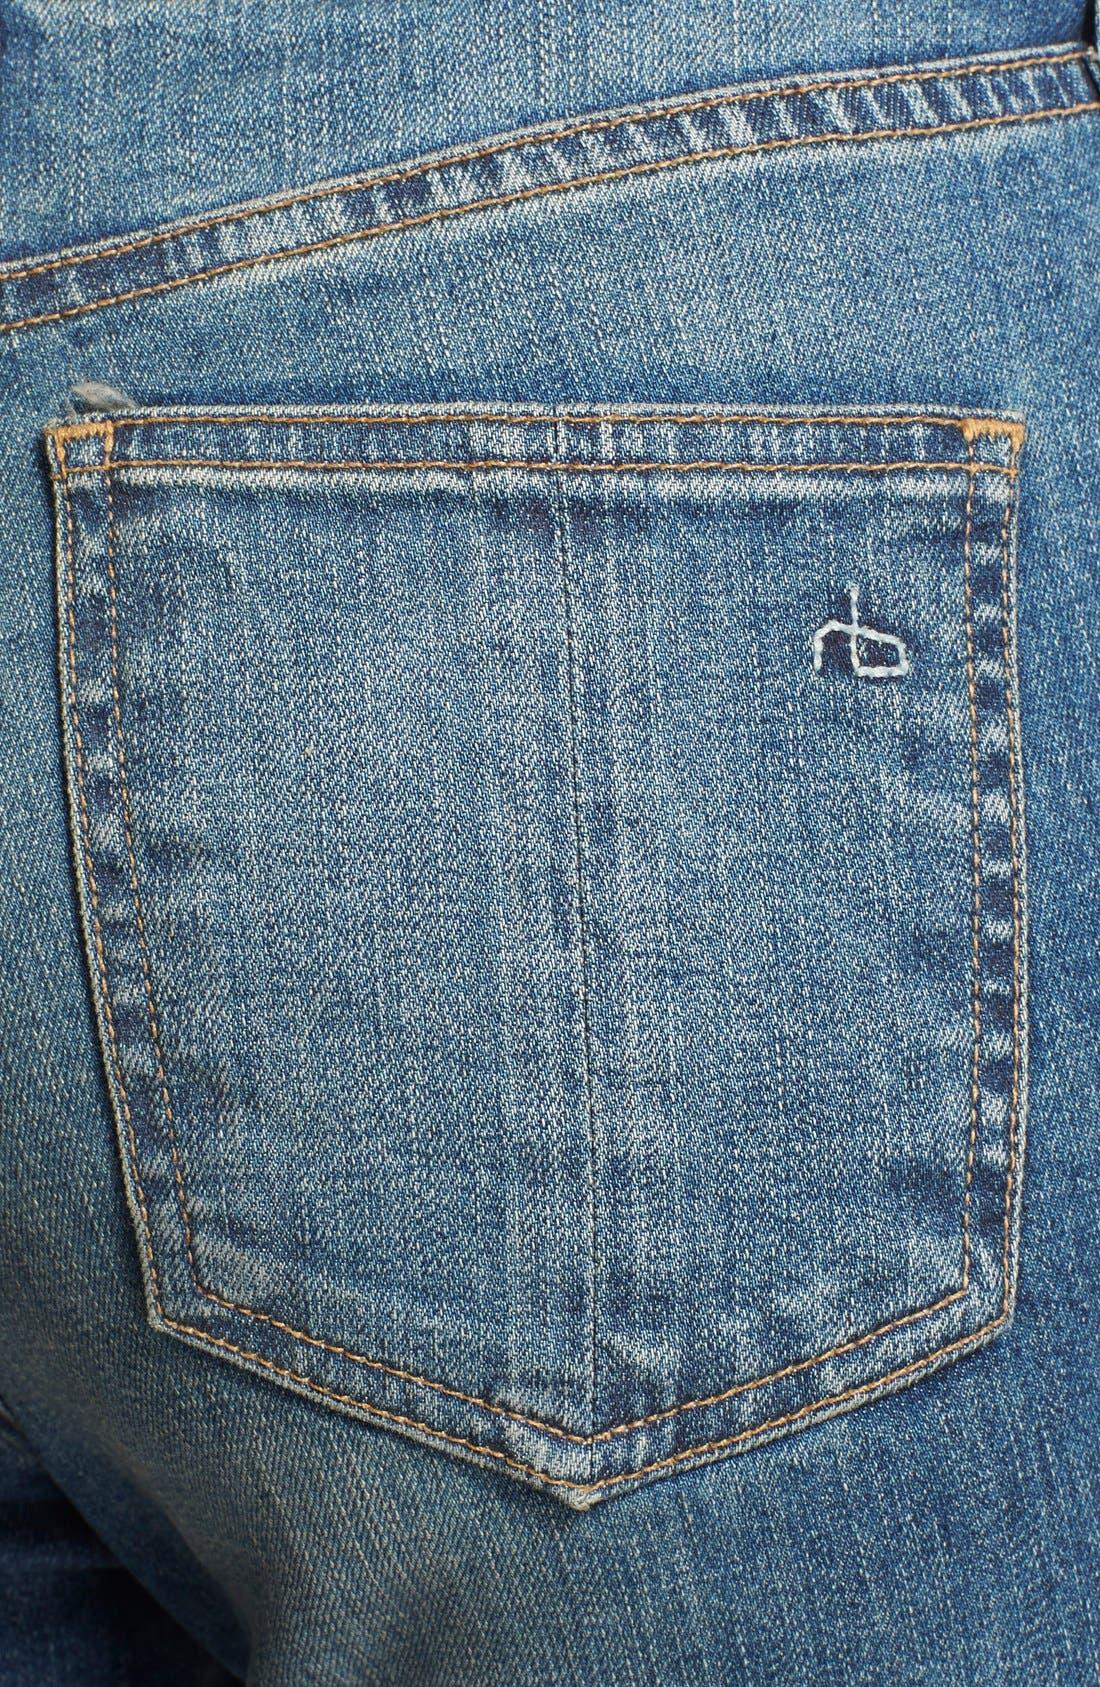 Alternate Image 3  - rag & bone/JEAN 'The Justine' High Rise Jeans (Surf)